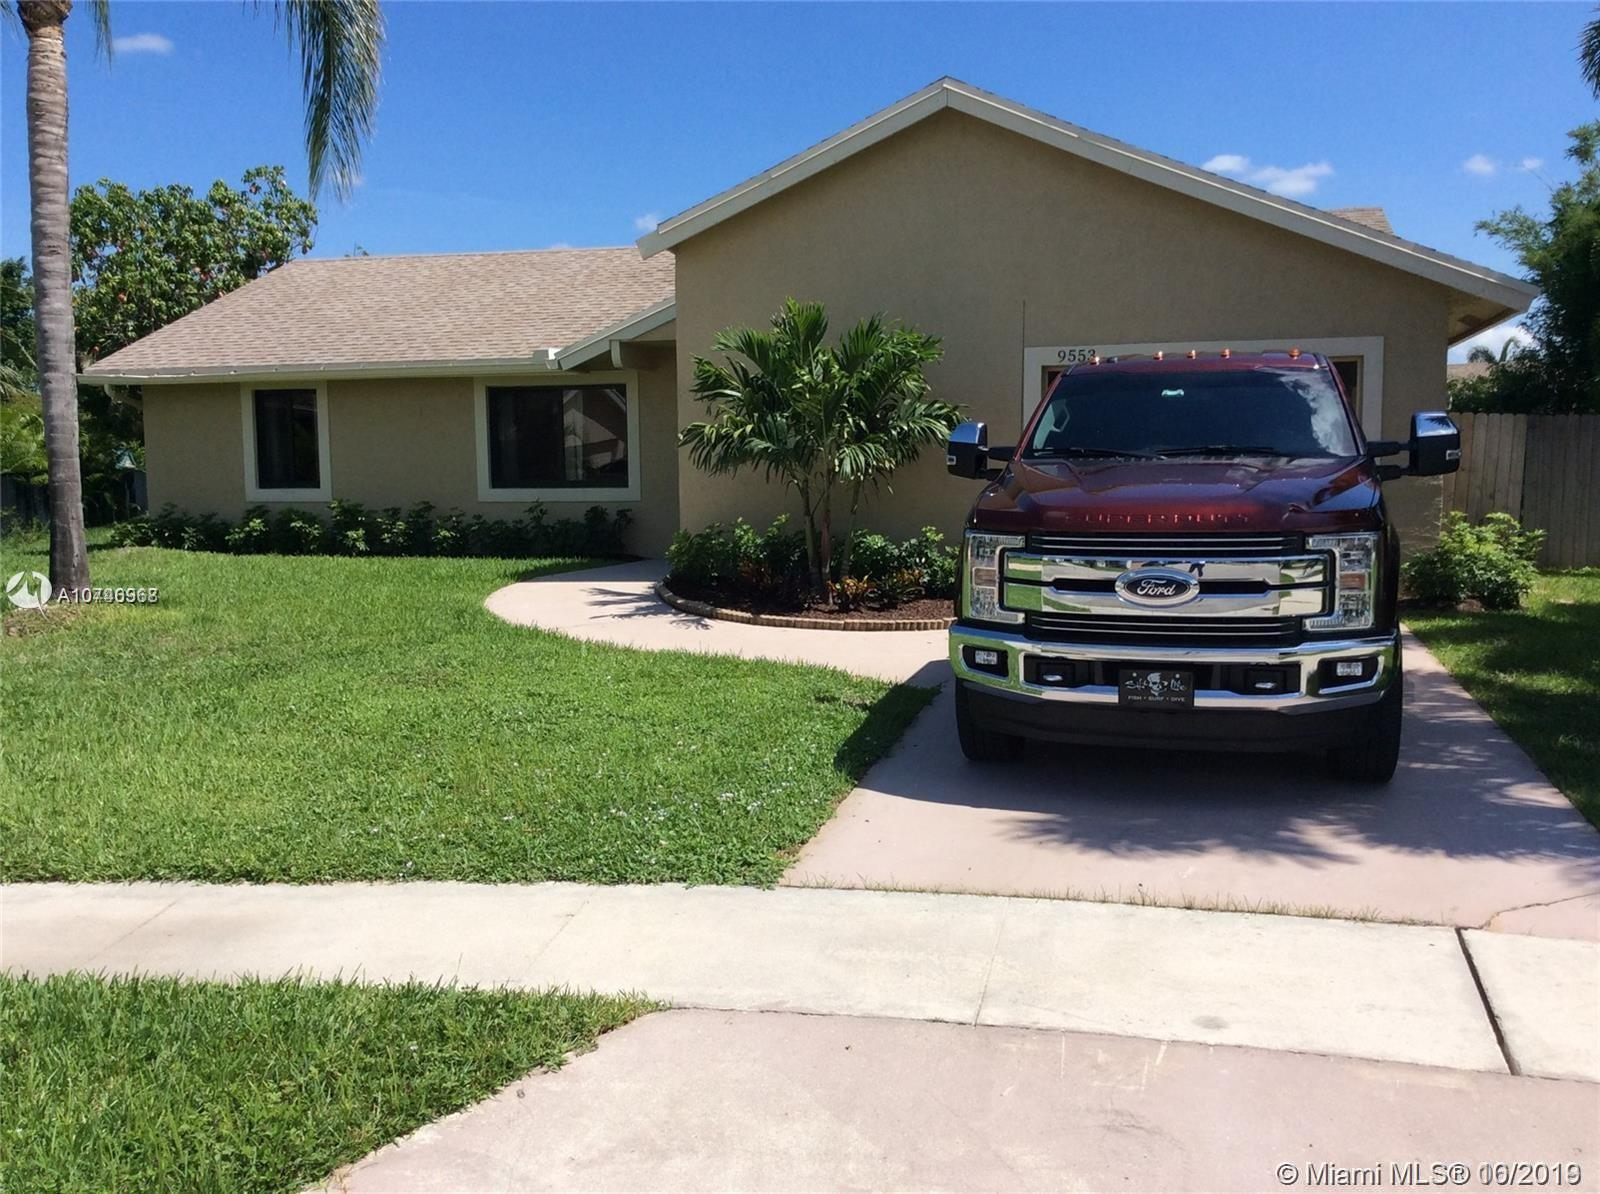 Property for sale at 9553 Denver Ct # 9553, Boca Raton FL 33434 Unit 9553, Boca Raton,  Florida 33434